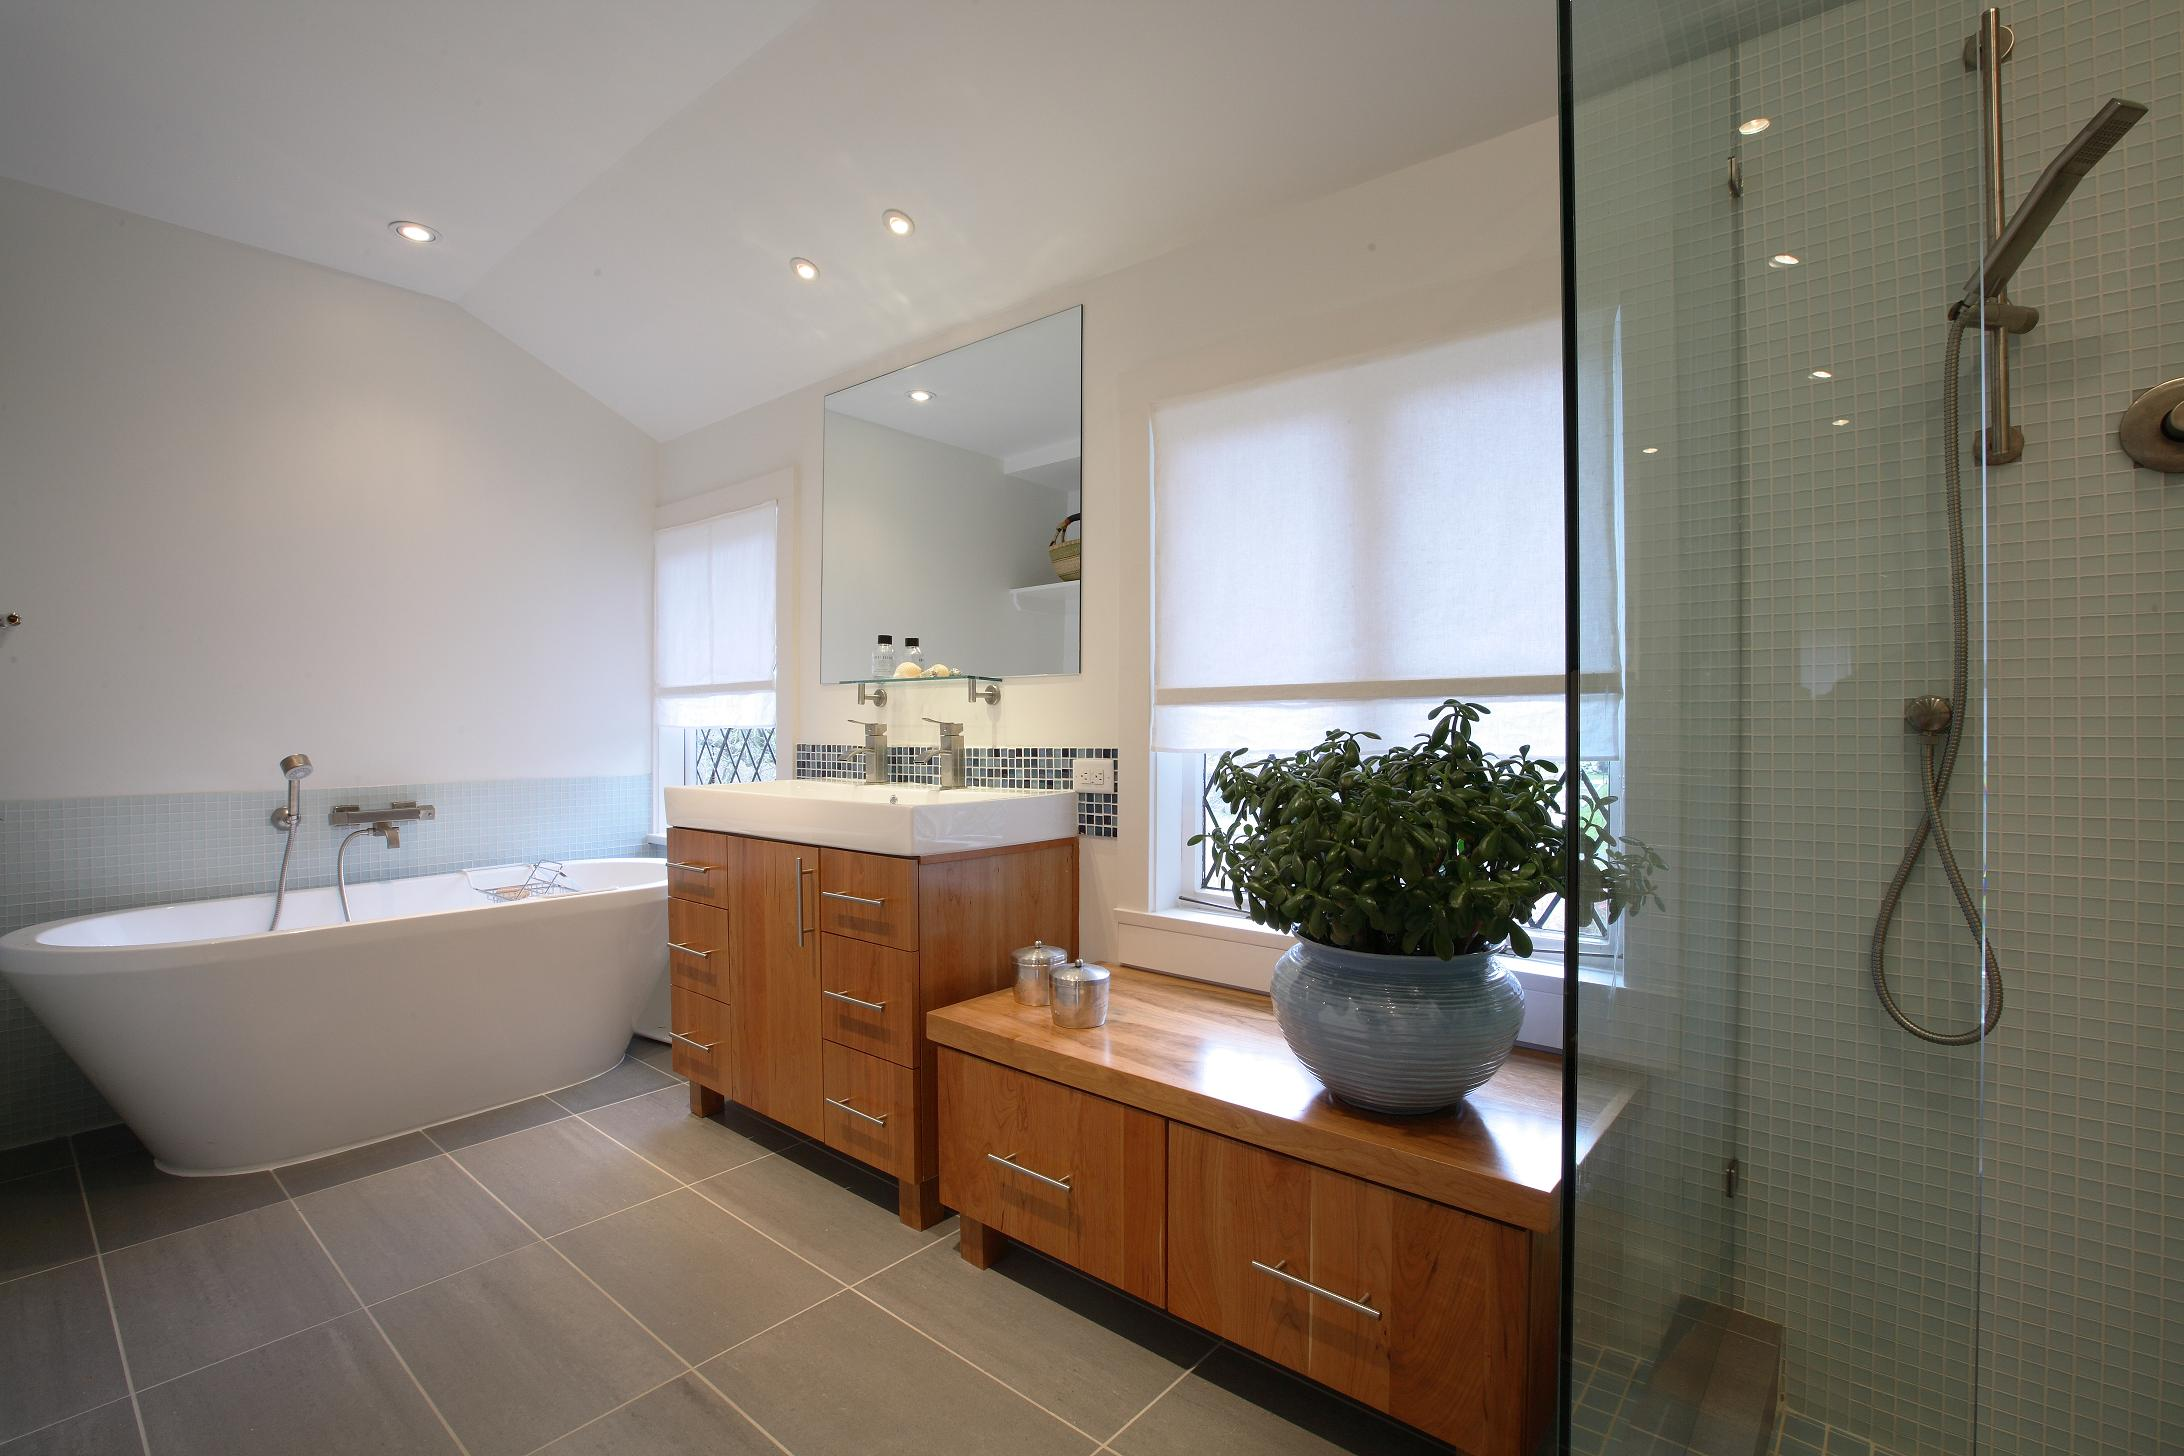 elegant bathroom decoration design with large white bathub and wooden vanity sets plus ceramic sink